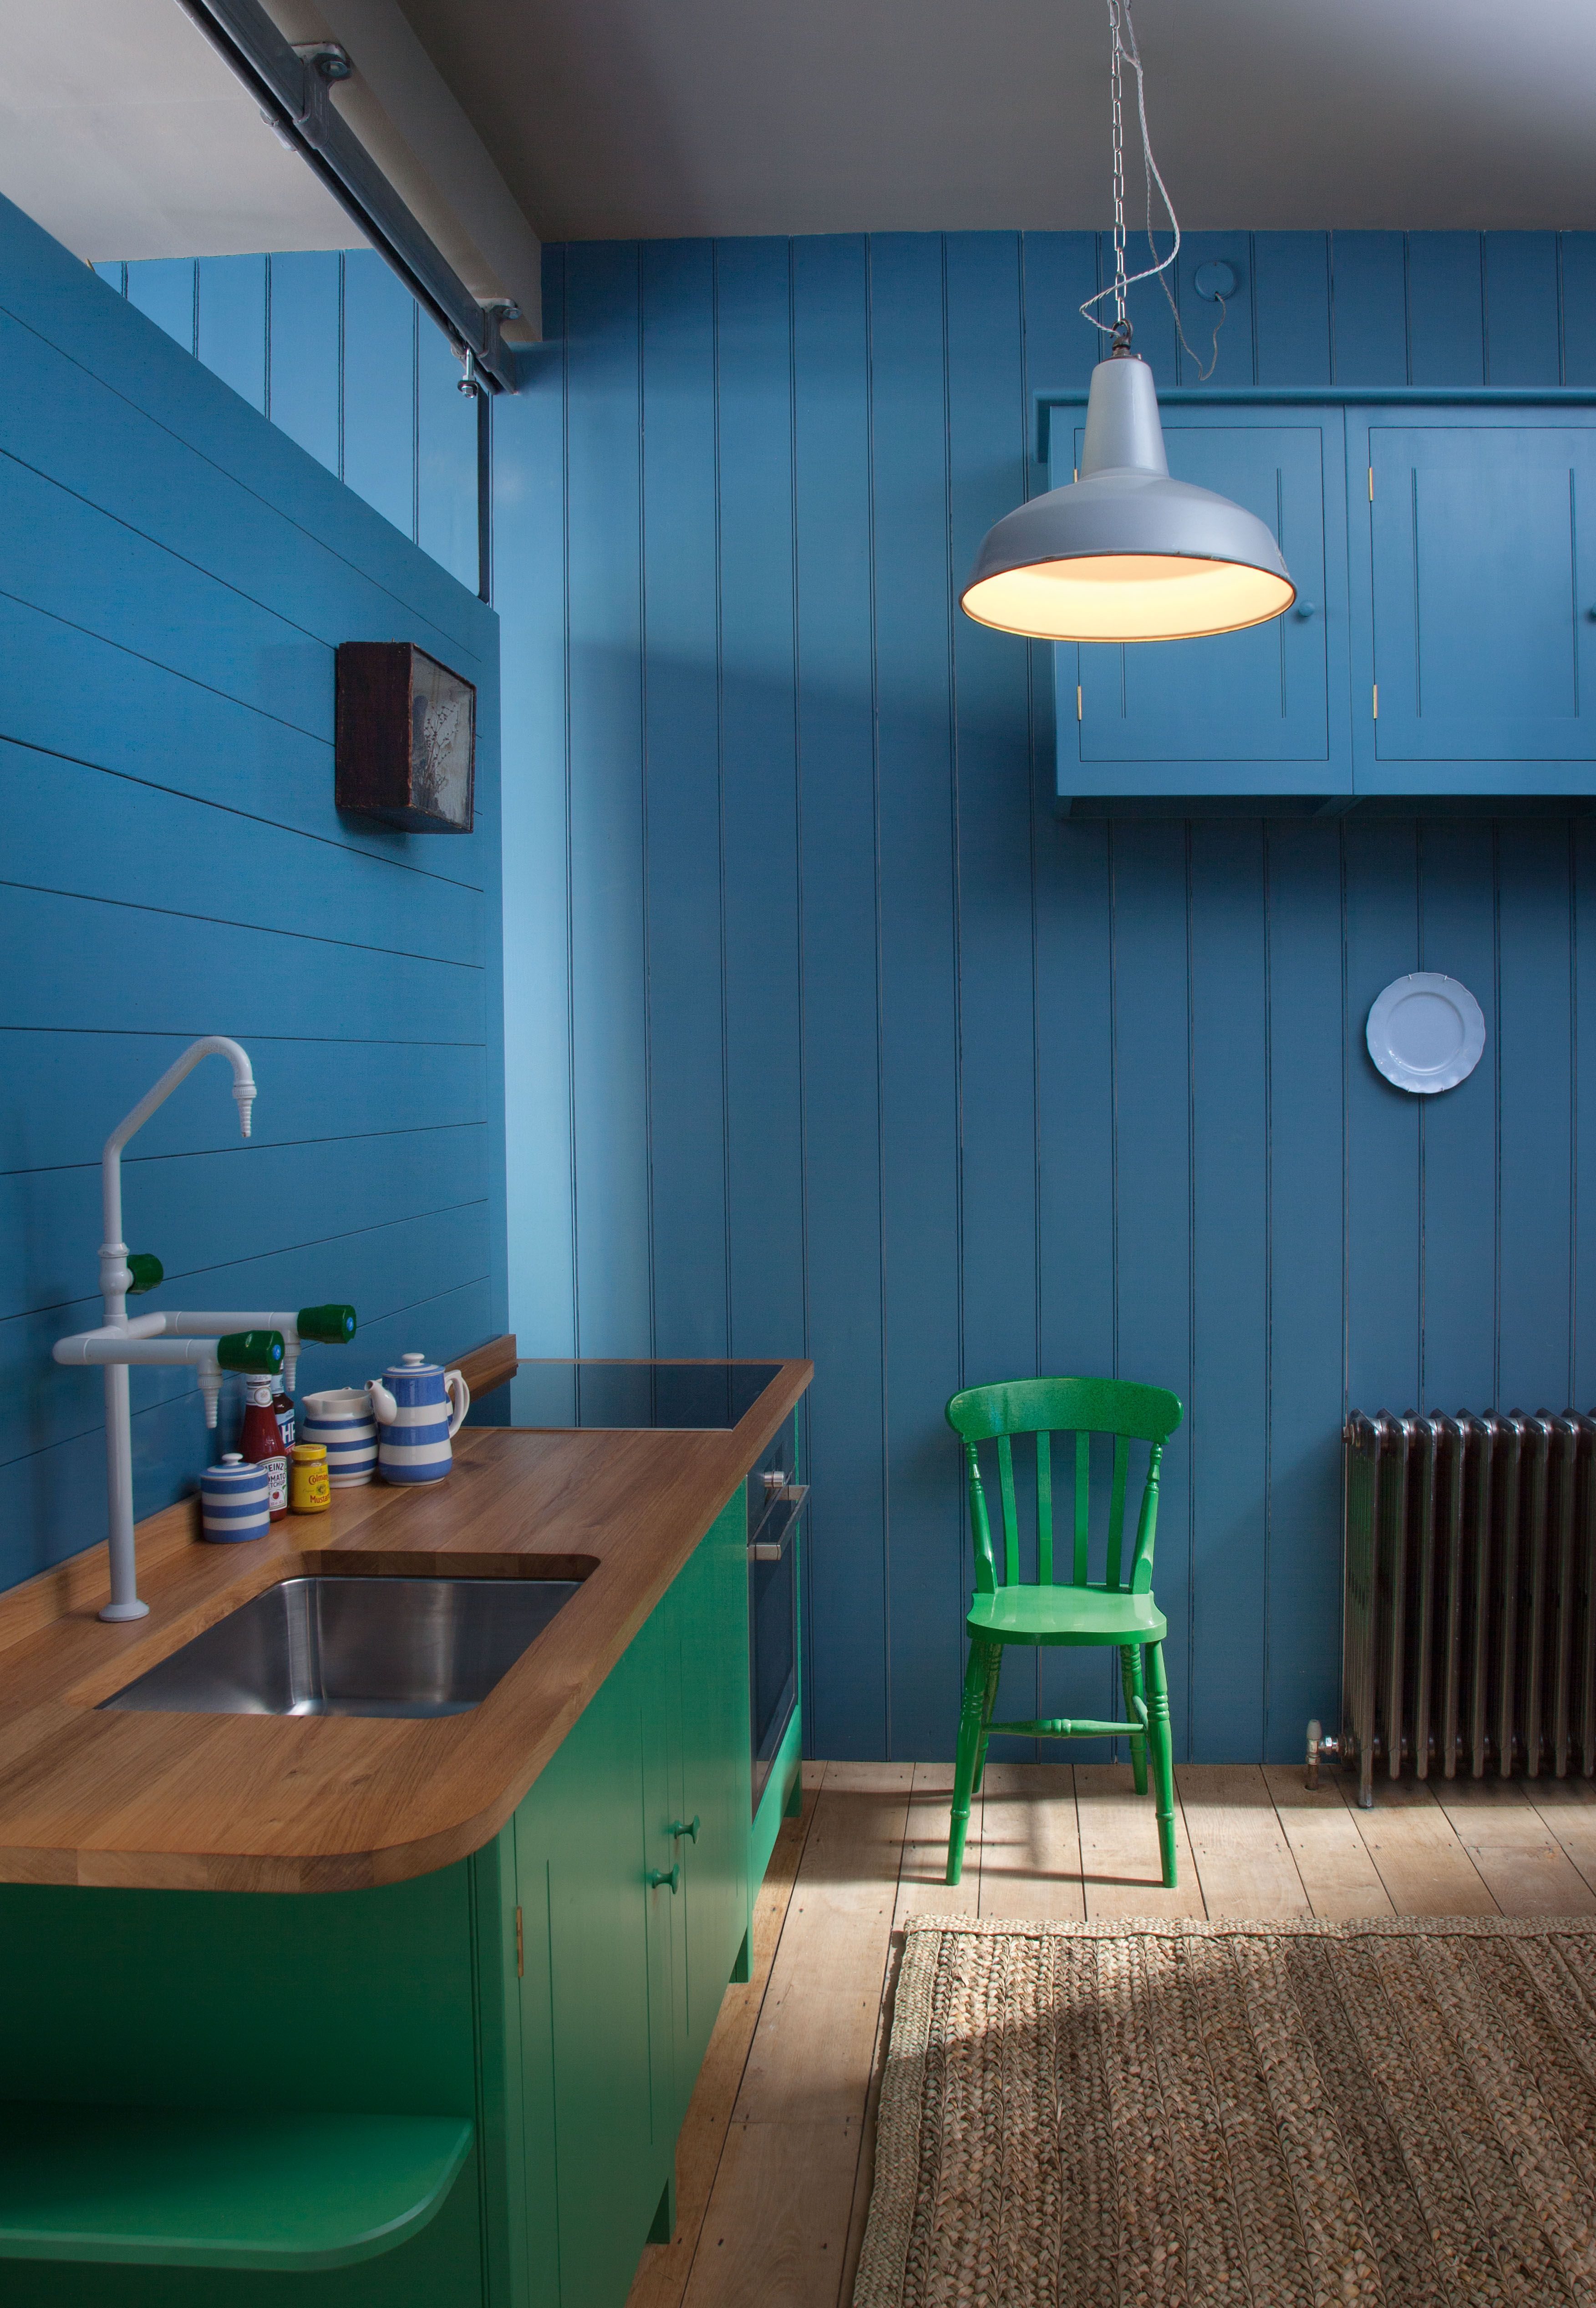 Green and Blue | Kjøkken | Pinterest | British standards, Kitchen ...